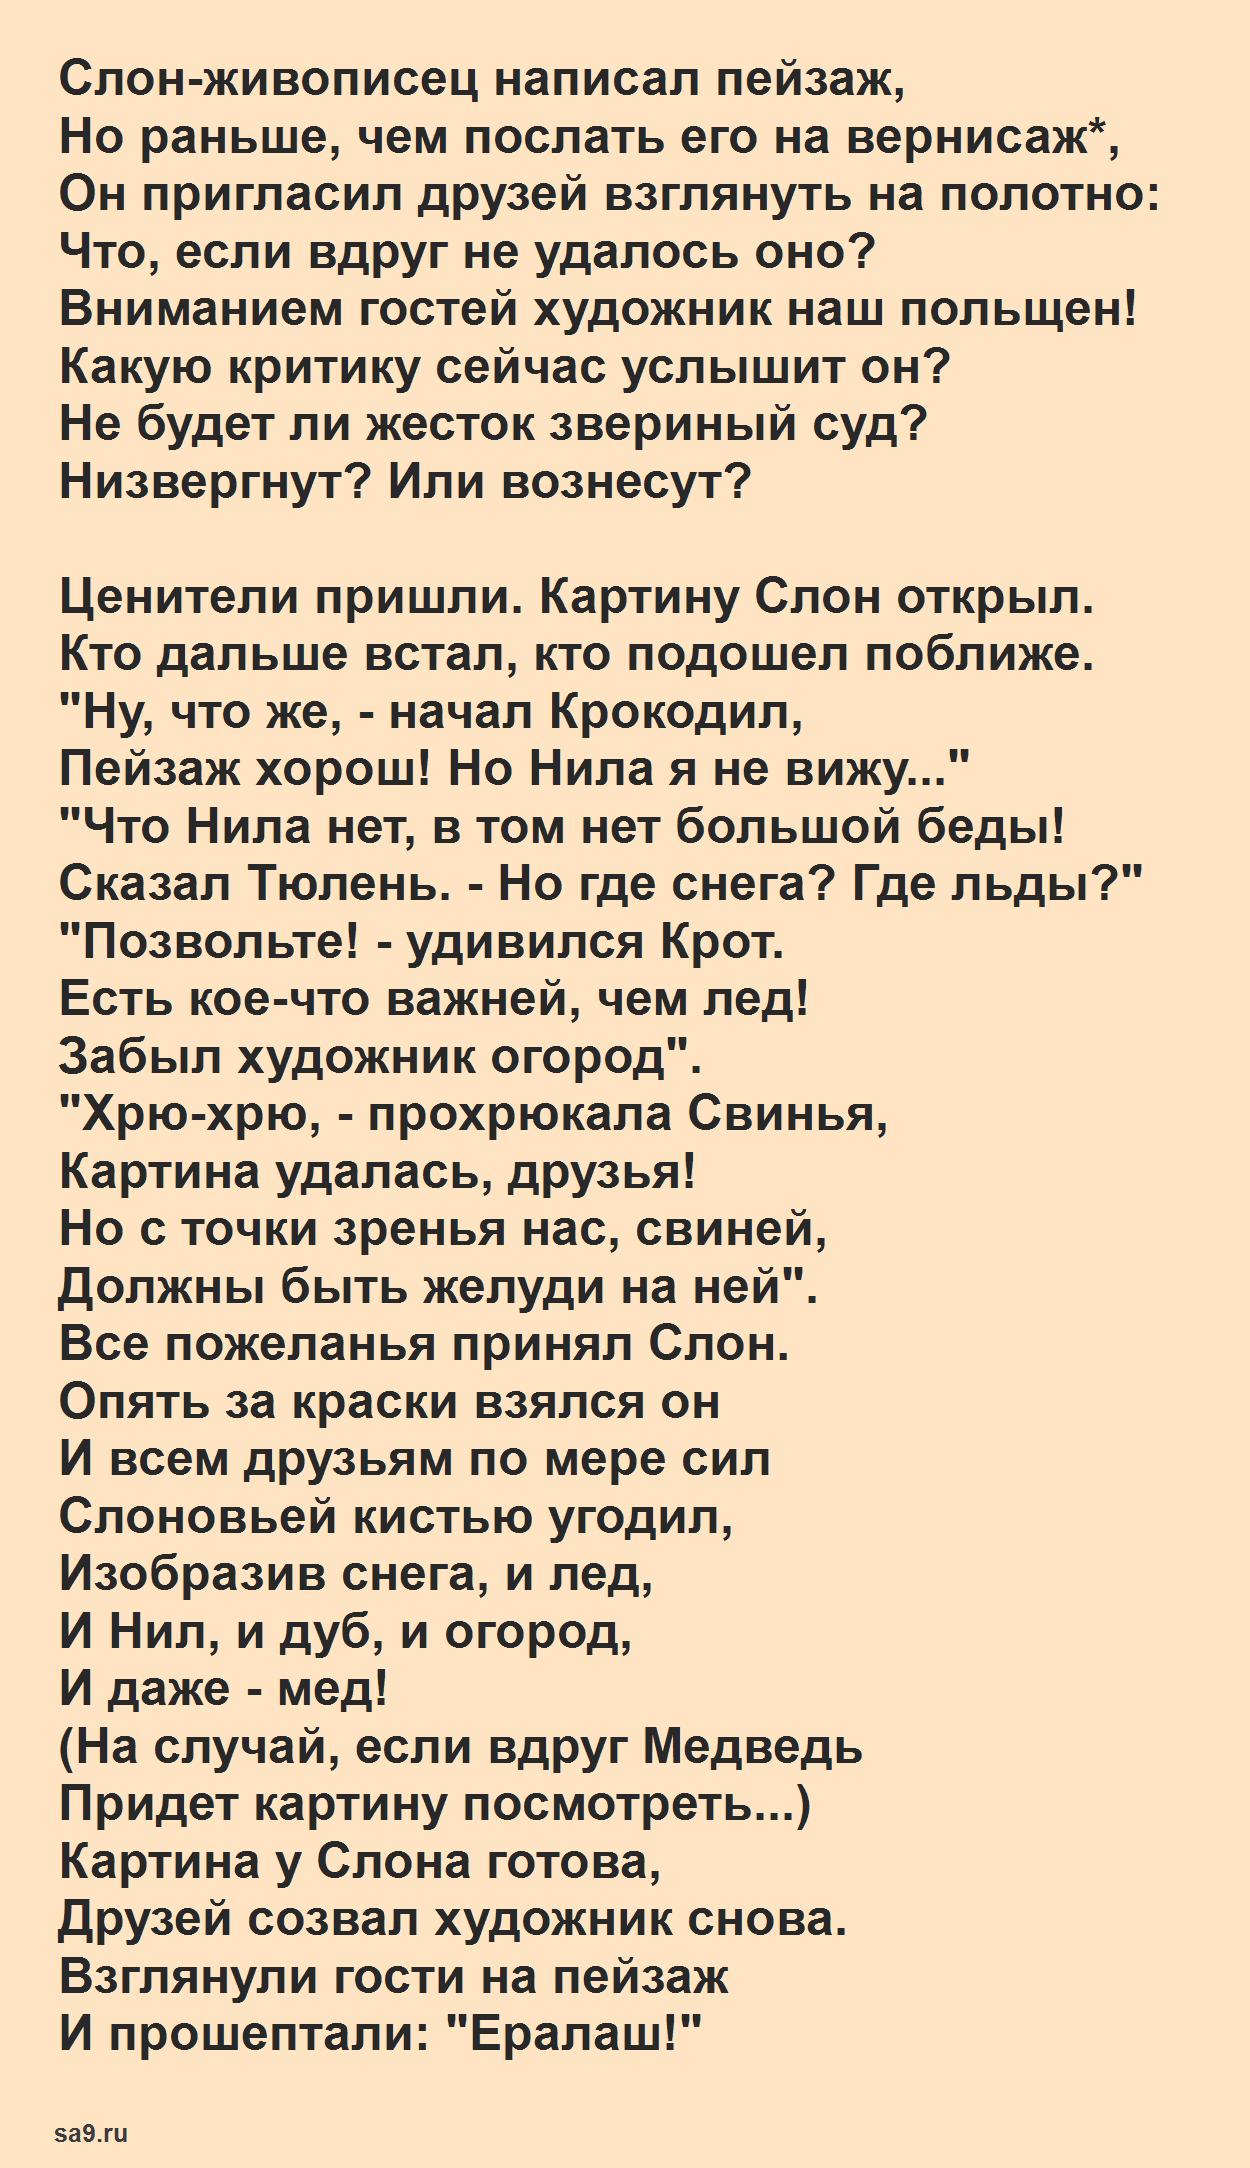 Басня Михалкова 'Слон-живописец', текст басни читать полностью